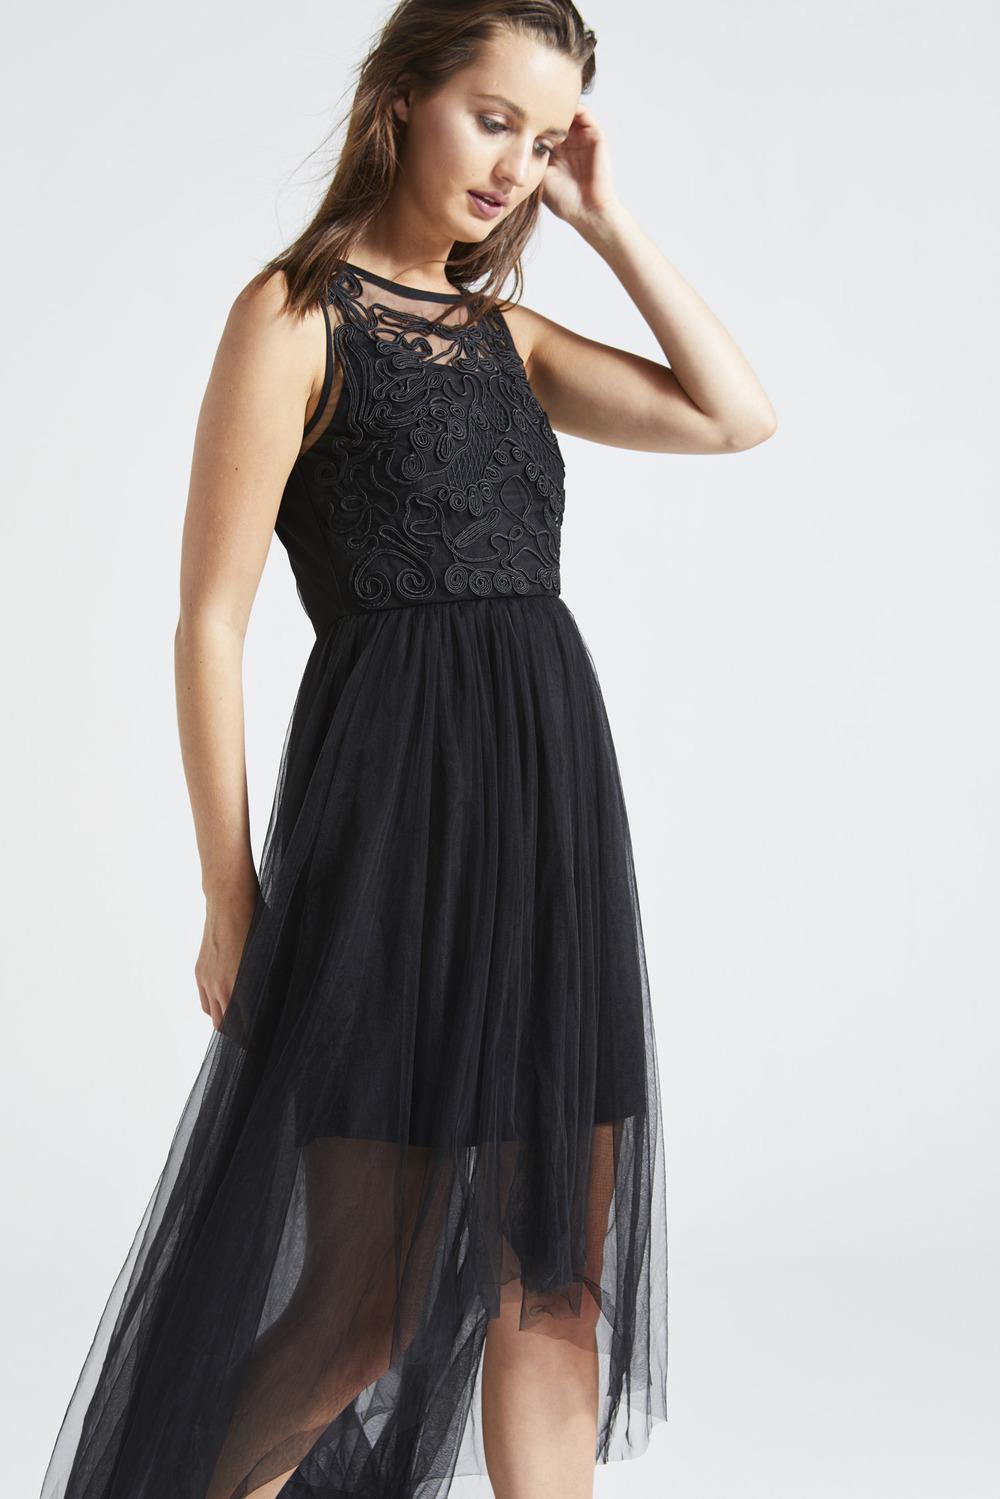 2546462b4553 Black Beaded Mesh Hi-Low Maxi Dress | Dresses | AngelEye Fashion